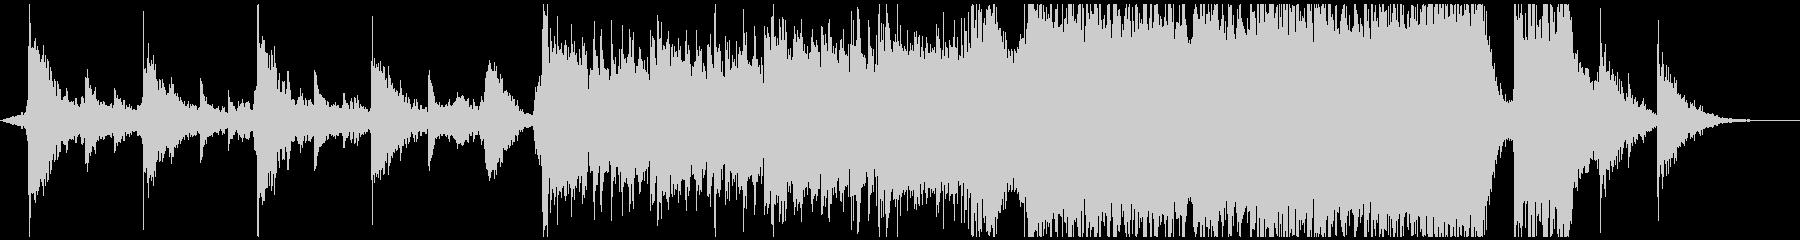 Damage IIIの未再生の波形